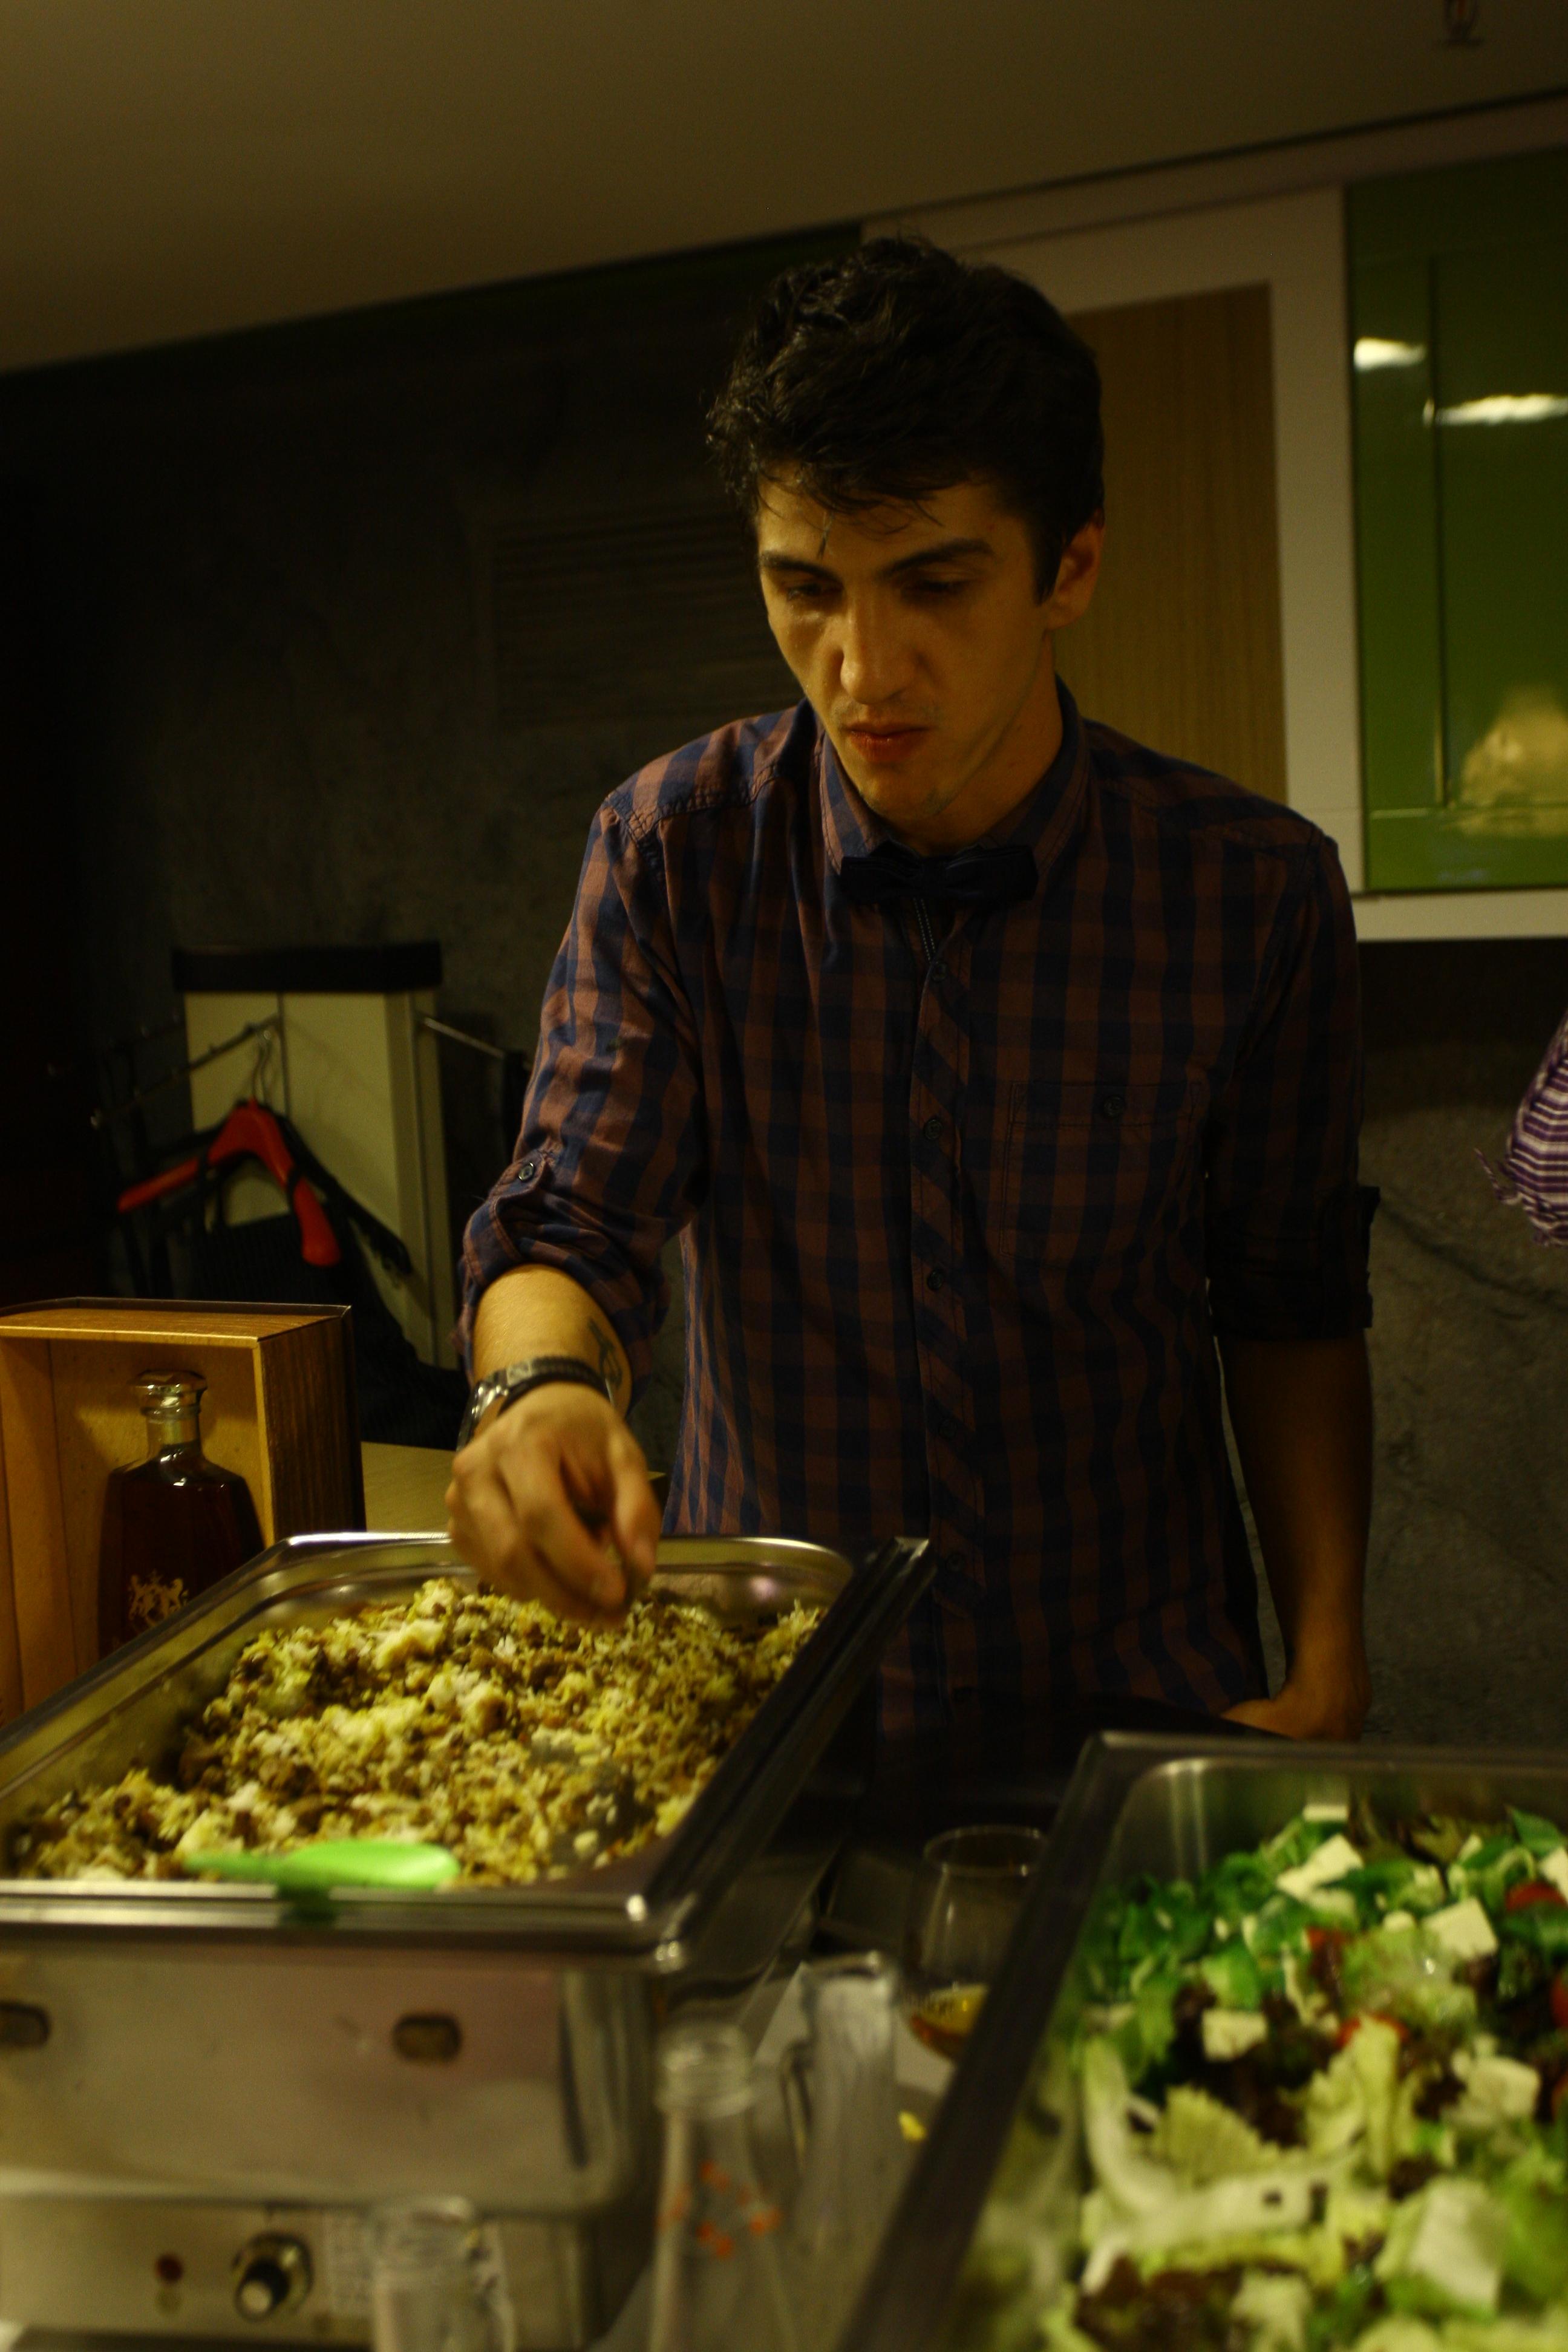 Bucatarul a deschis un restaurant cu concept inedit